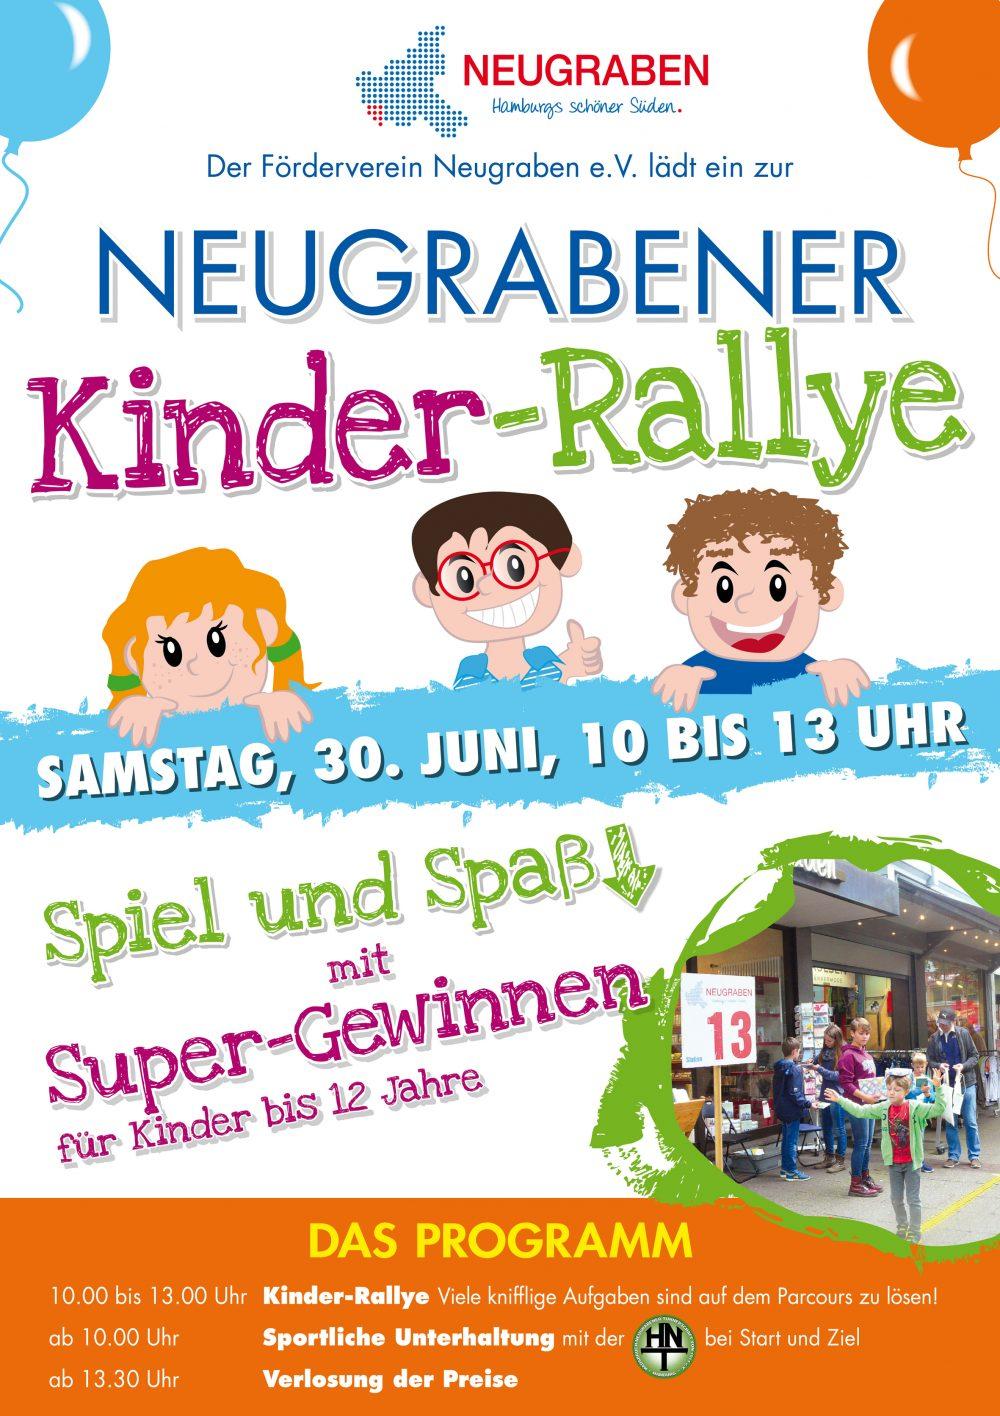 Termin merken für Kinder-Rallye